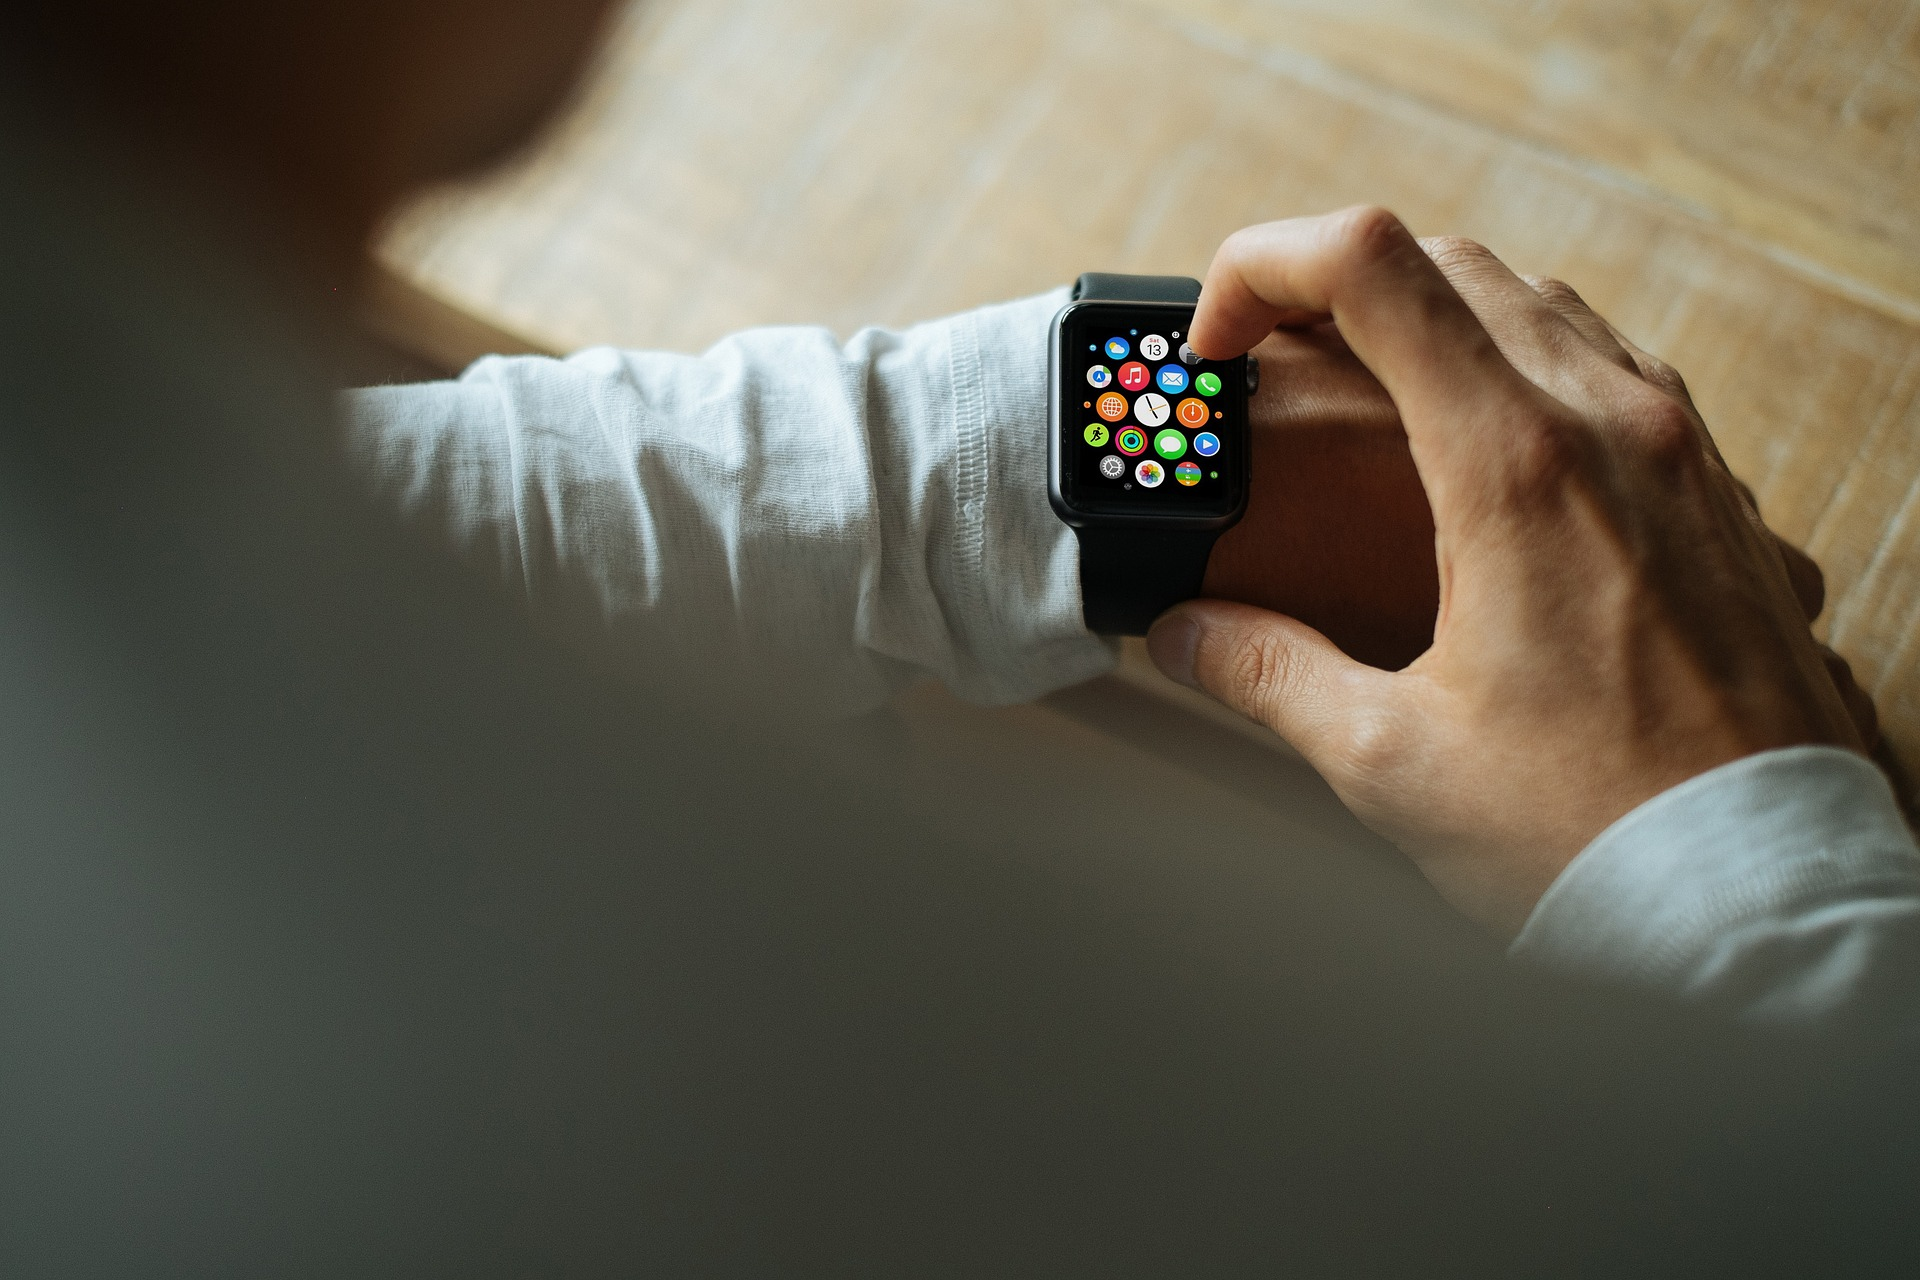 smart-watch-821563_1920